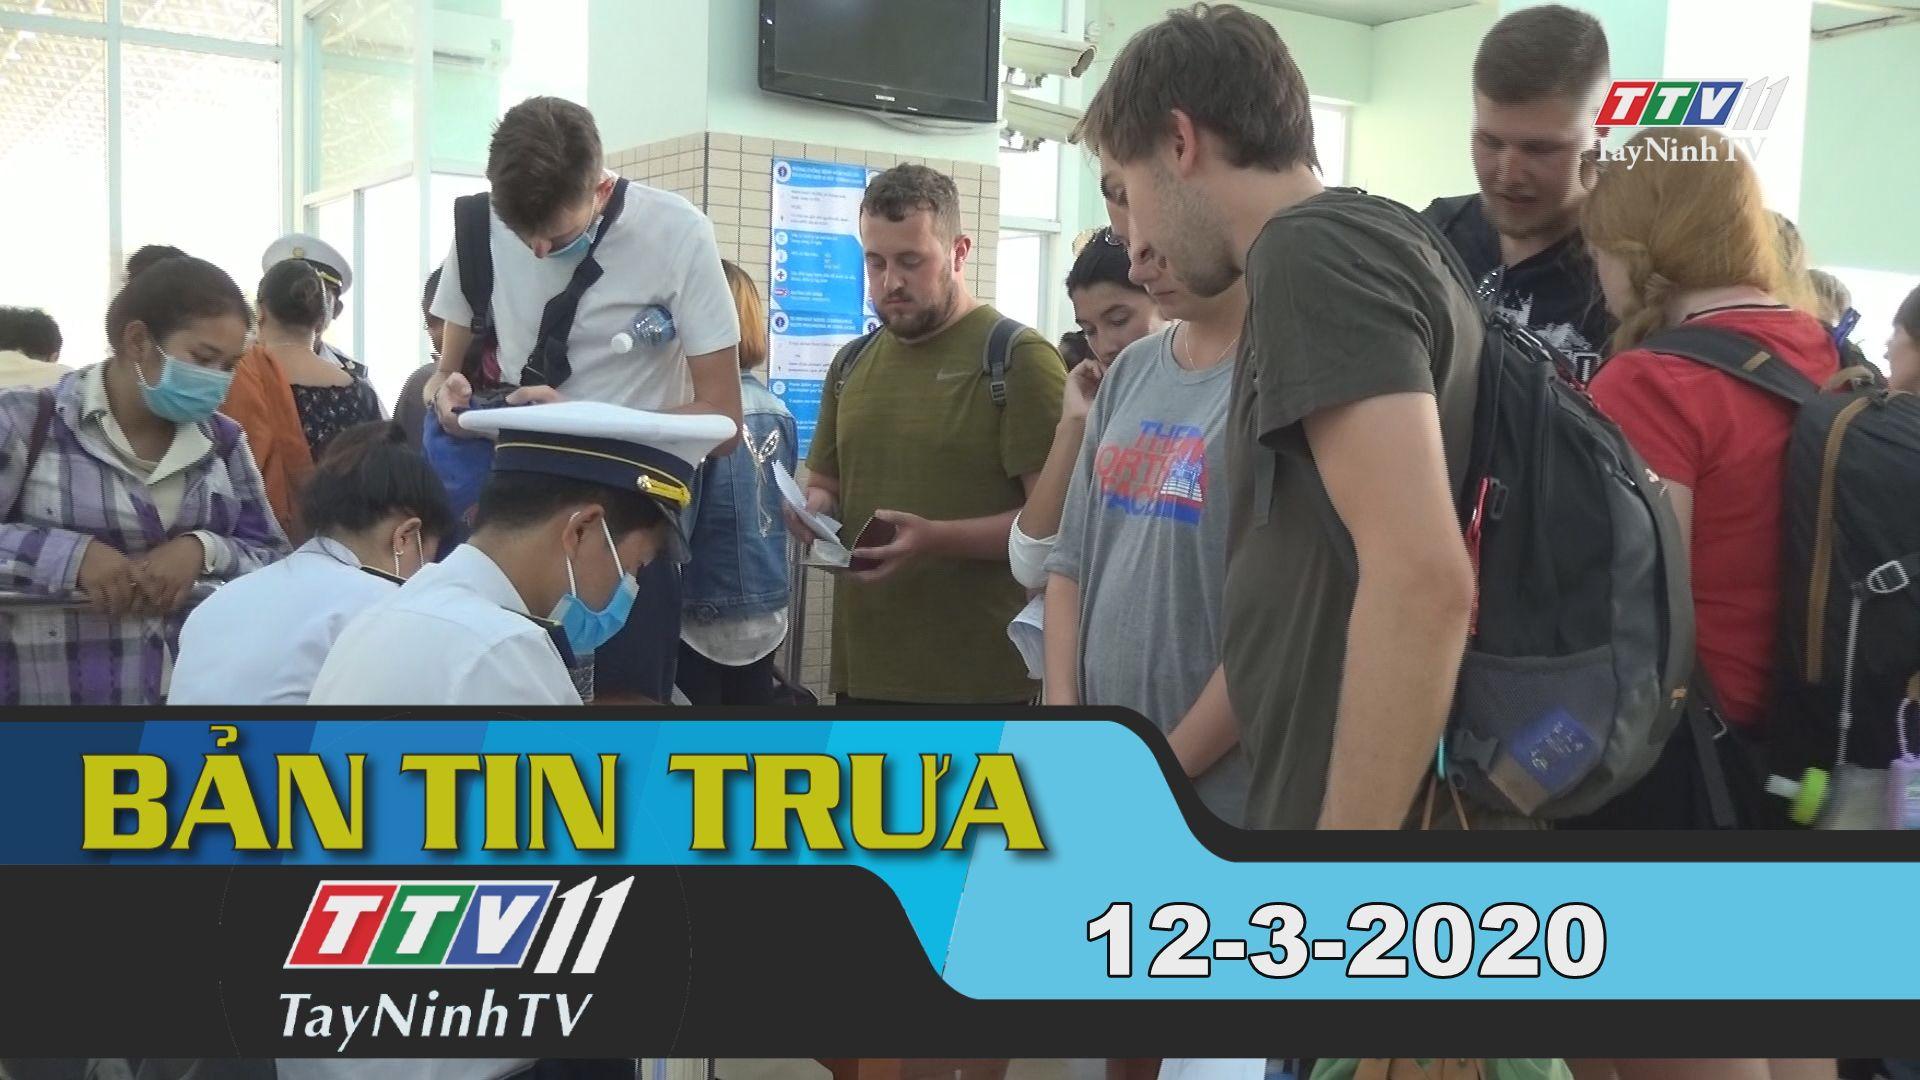 Bản tin trưa 12-3-2020 | Tin tức hôm nay | TayNinhTV